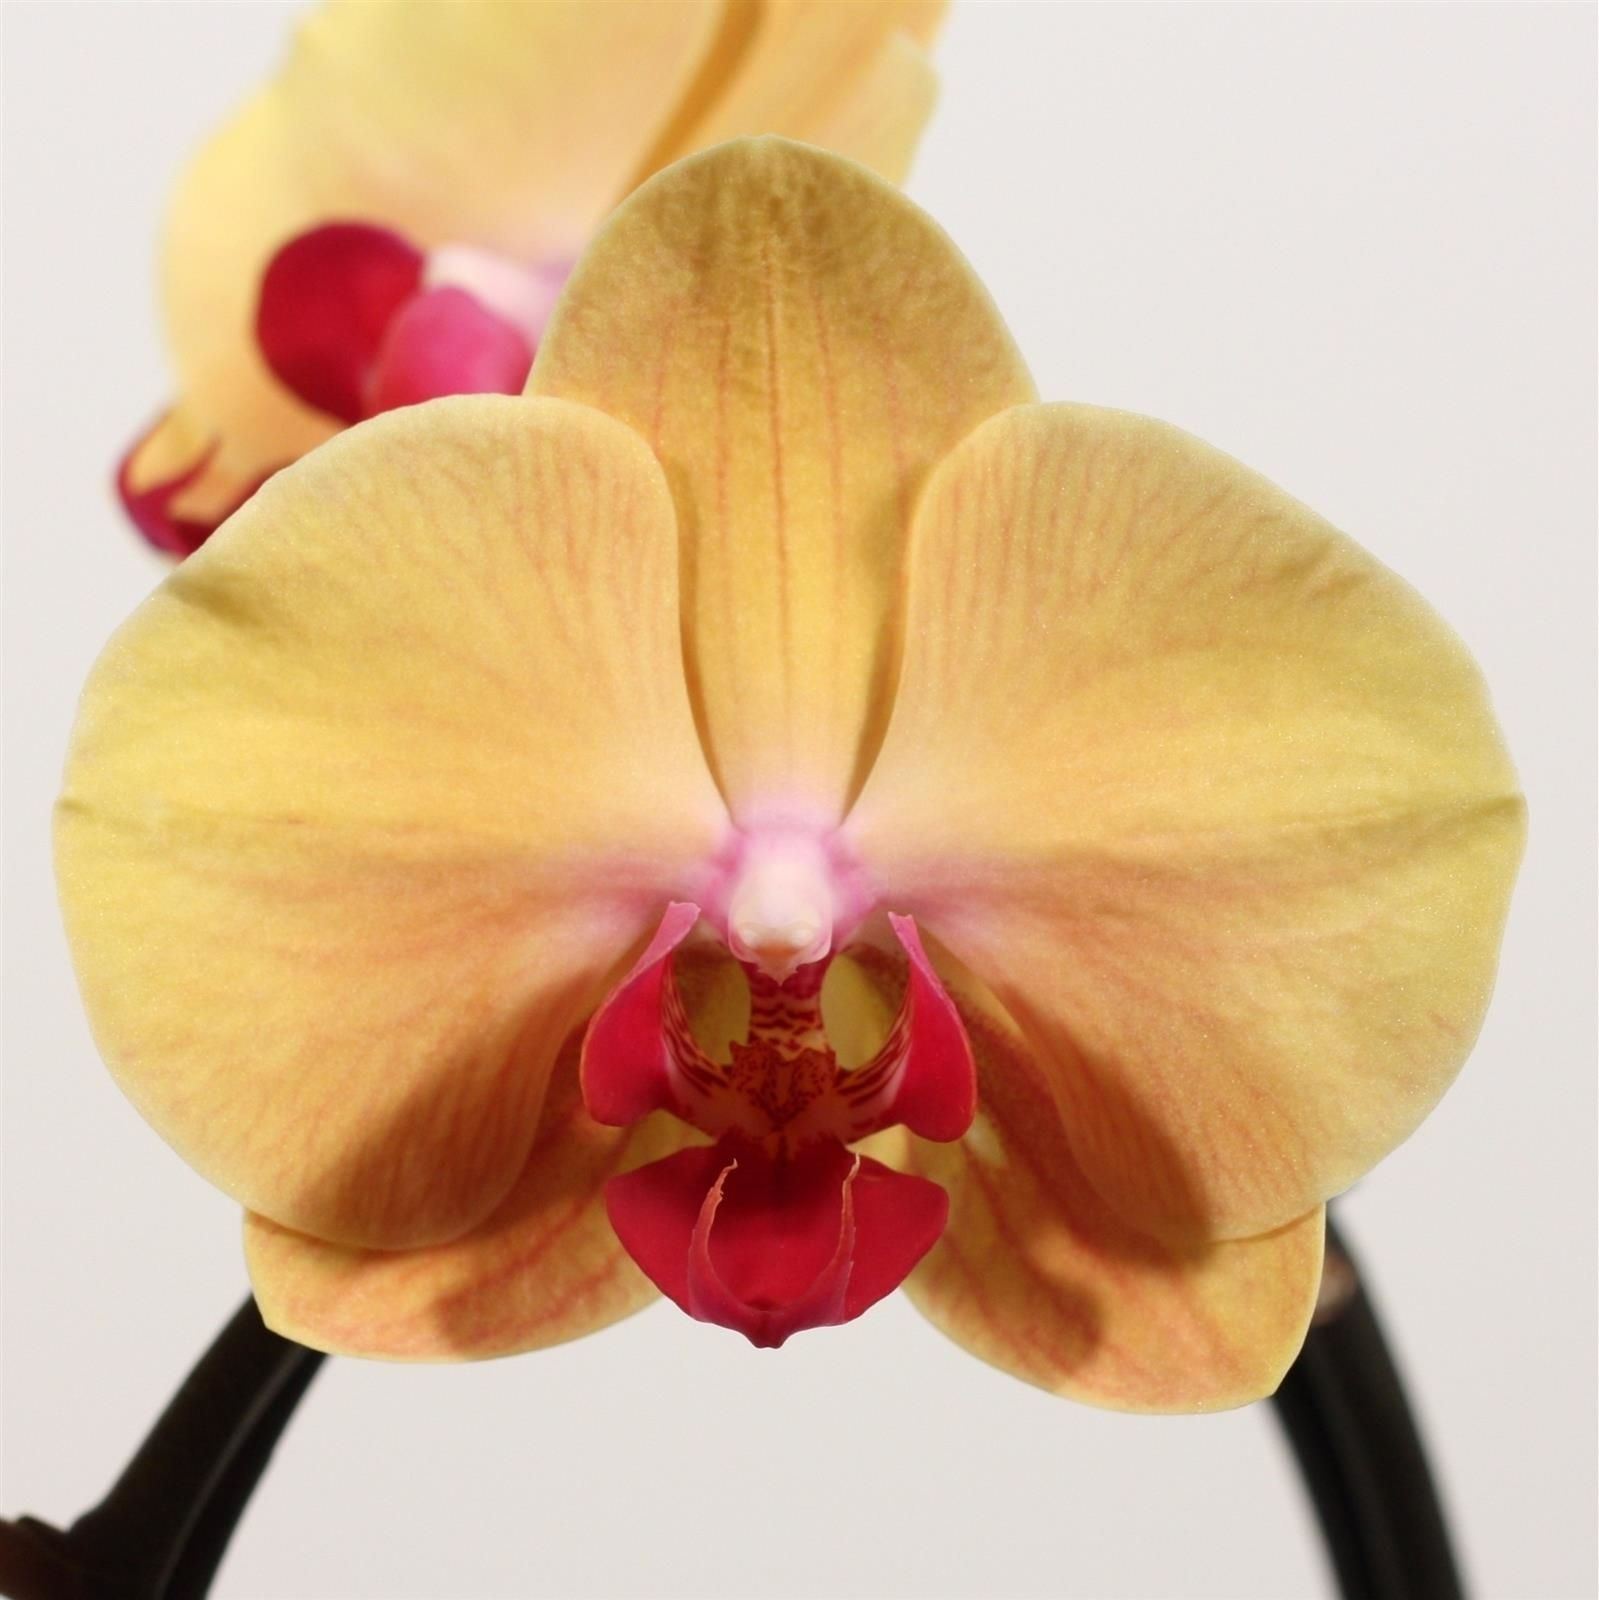 орхидеи голд раш фото где они